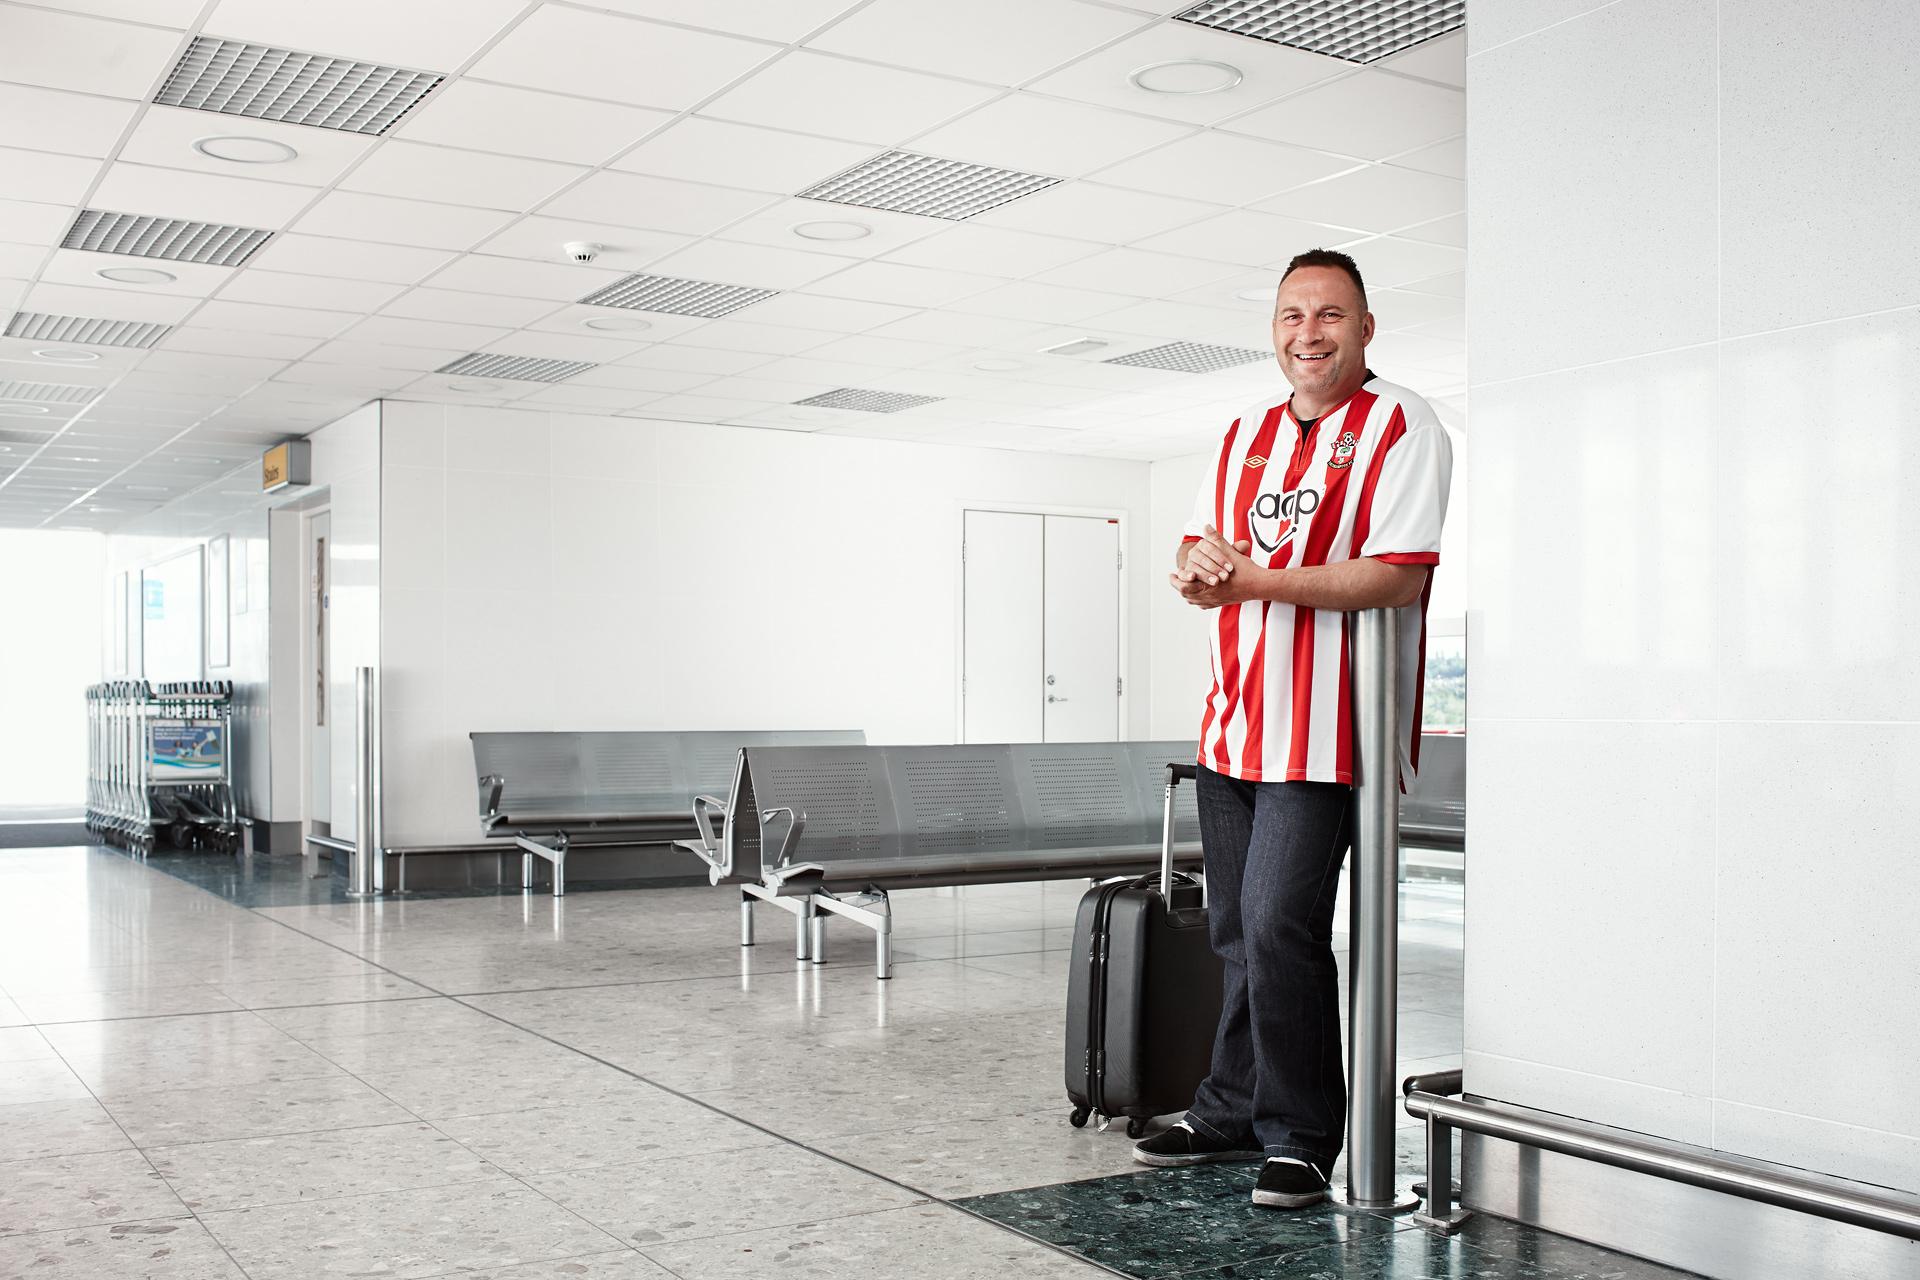 Southampton_Airport